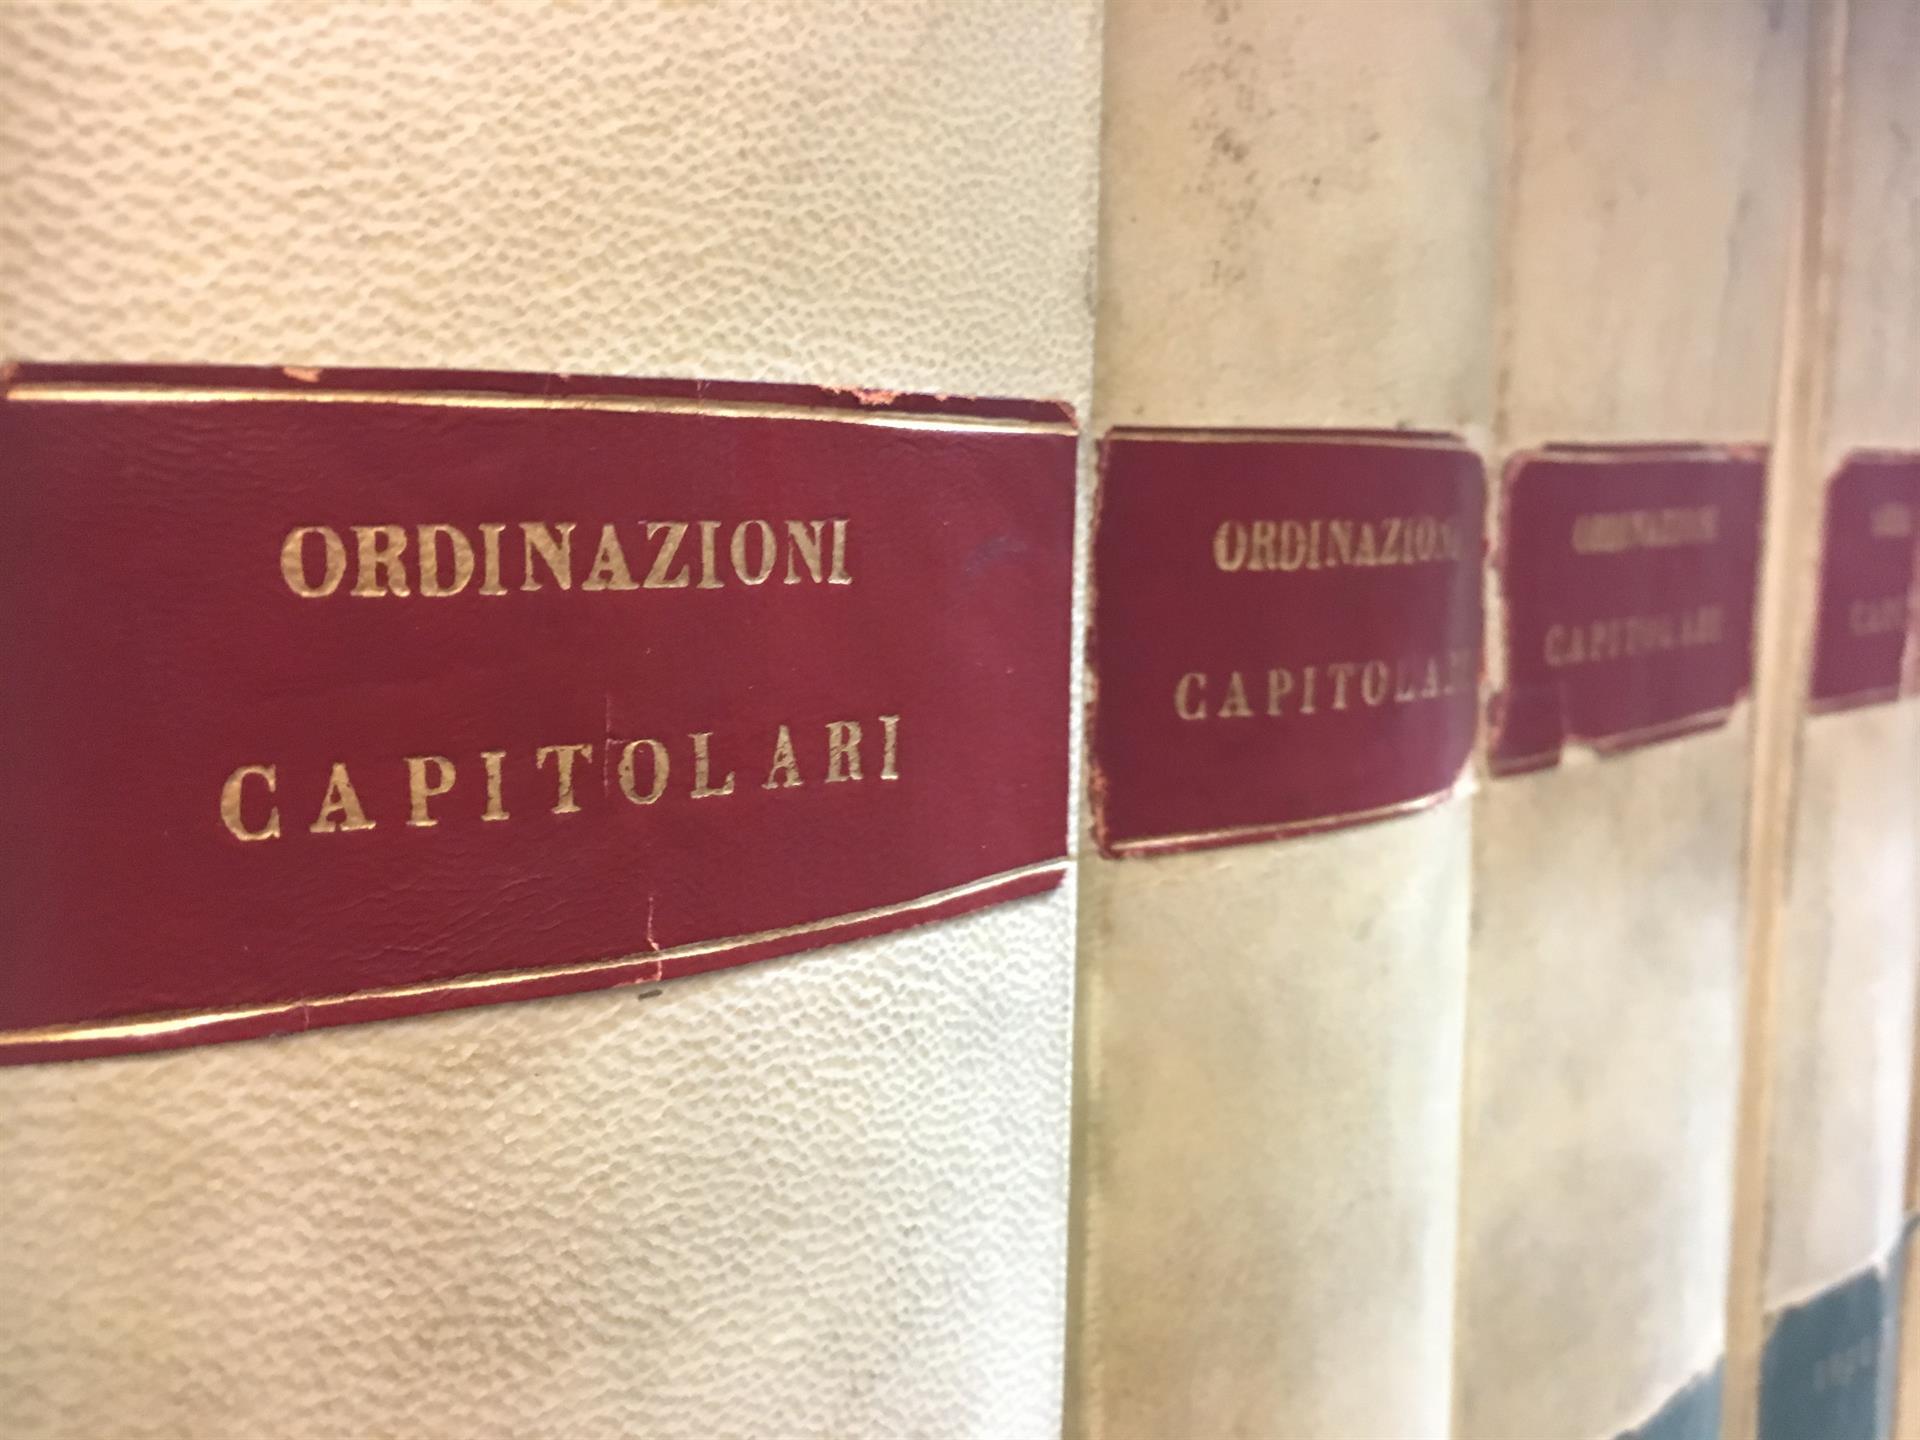 Ordinazioni Capitolari News